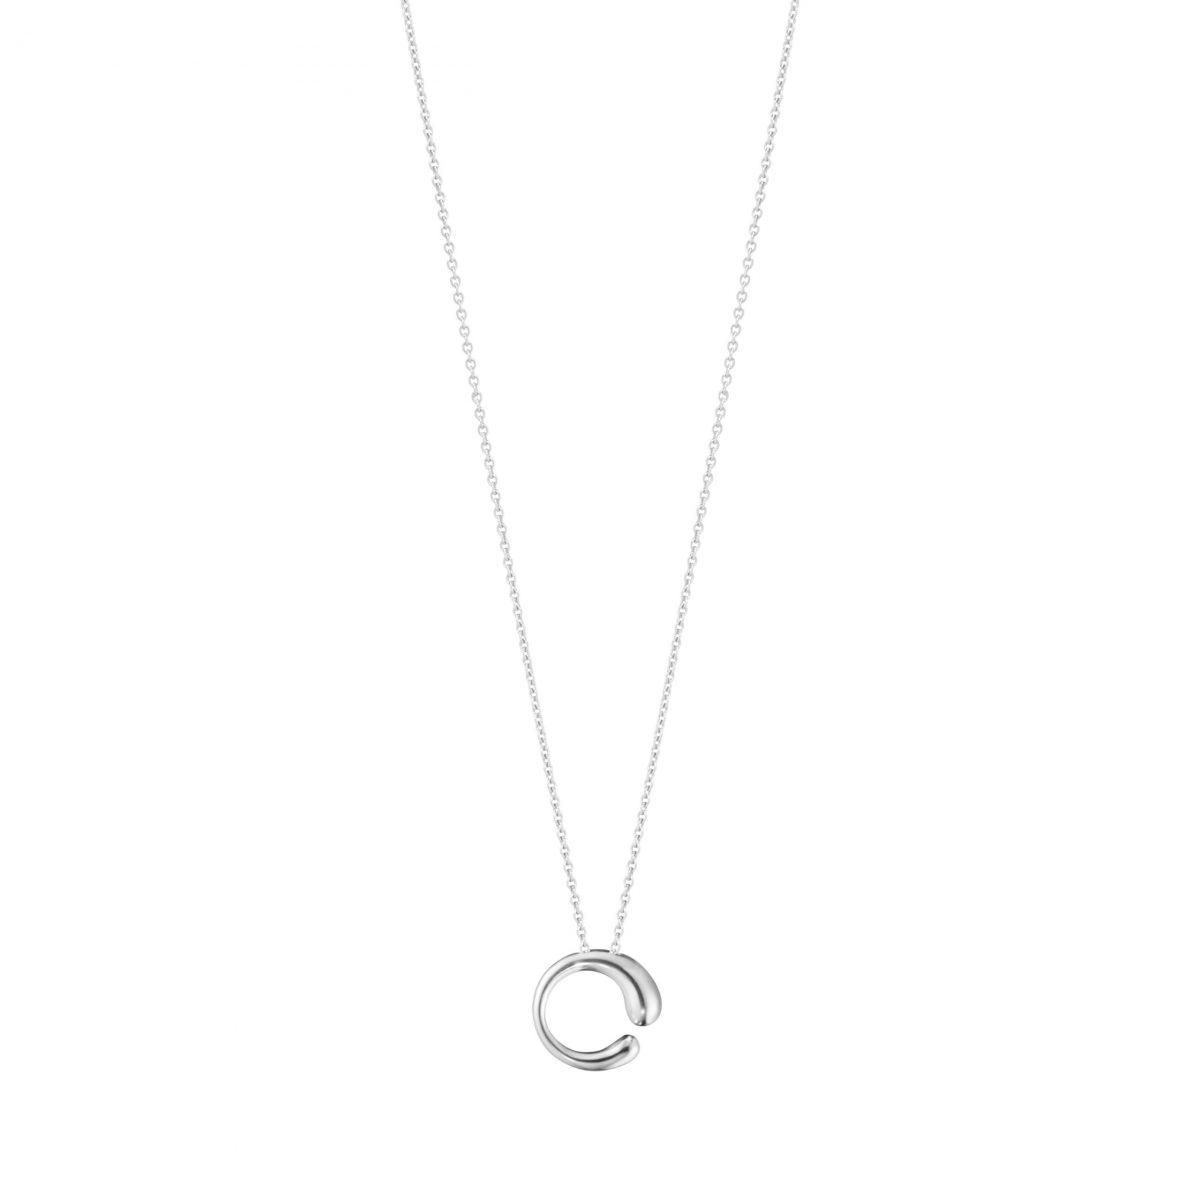 product/1/0/10015155_mercy_small_pendant_634a_silver_jpg_max_3000x3000_466214.jpg